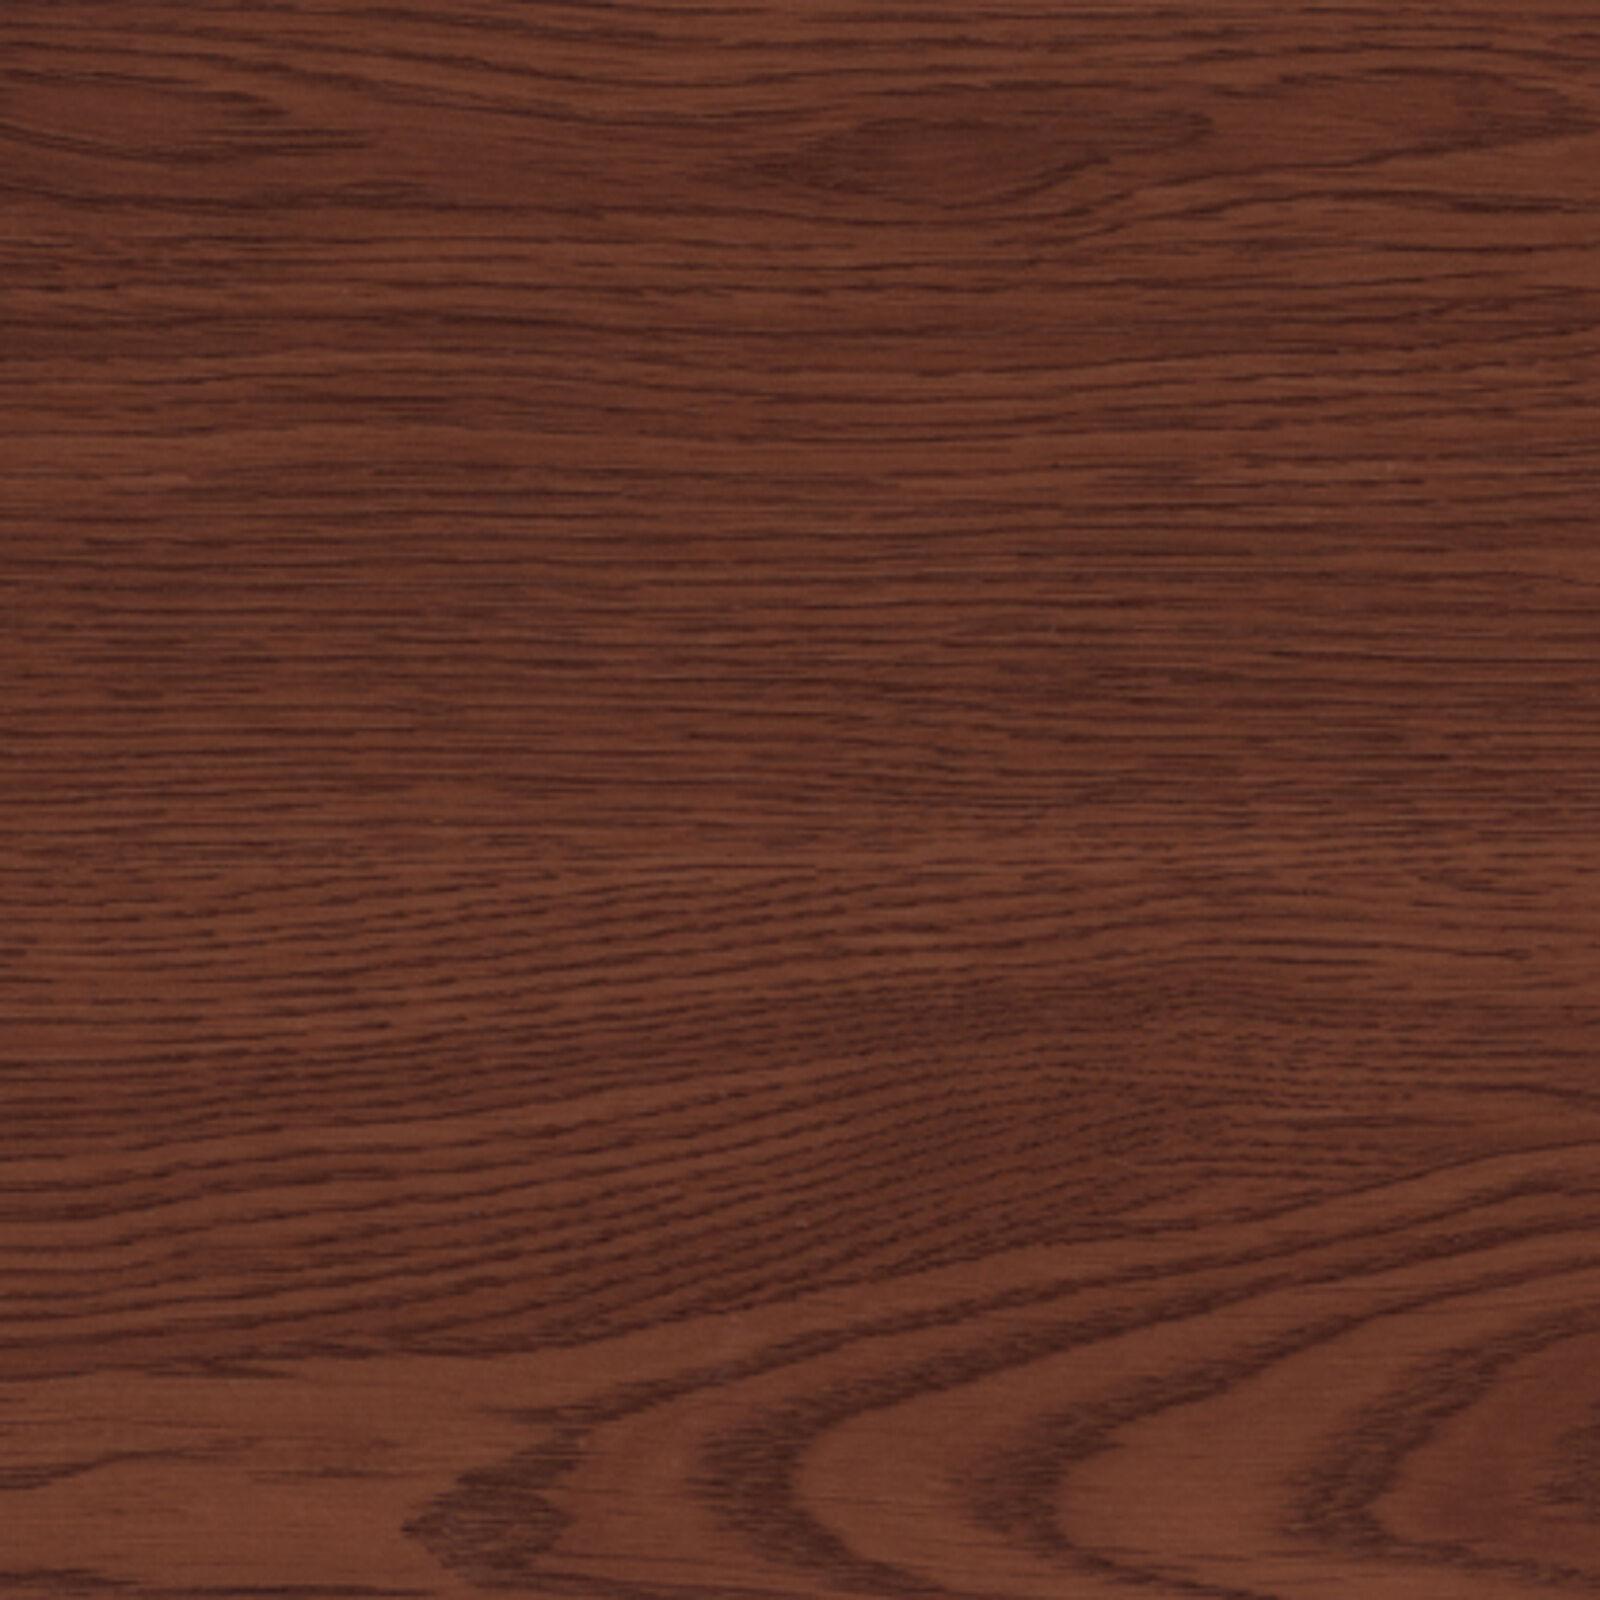 Mannington Vinyl Luxary Commercial Walkway Classic Oak Ww108 2304